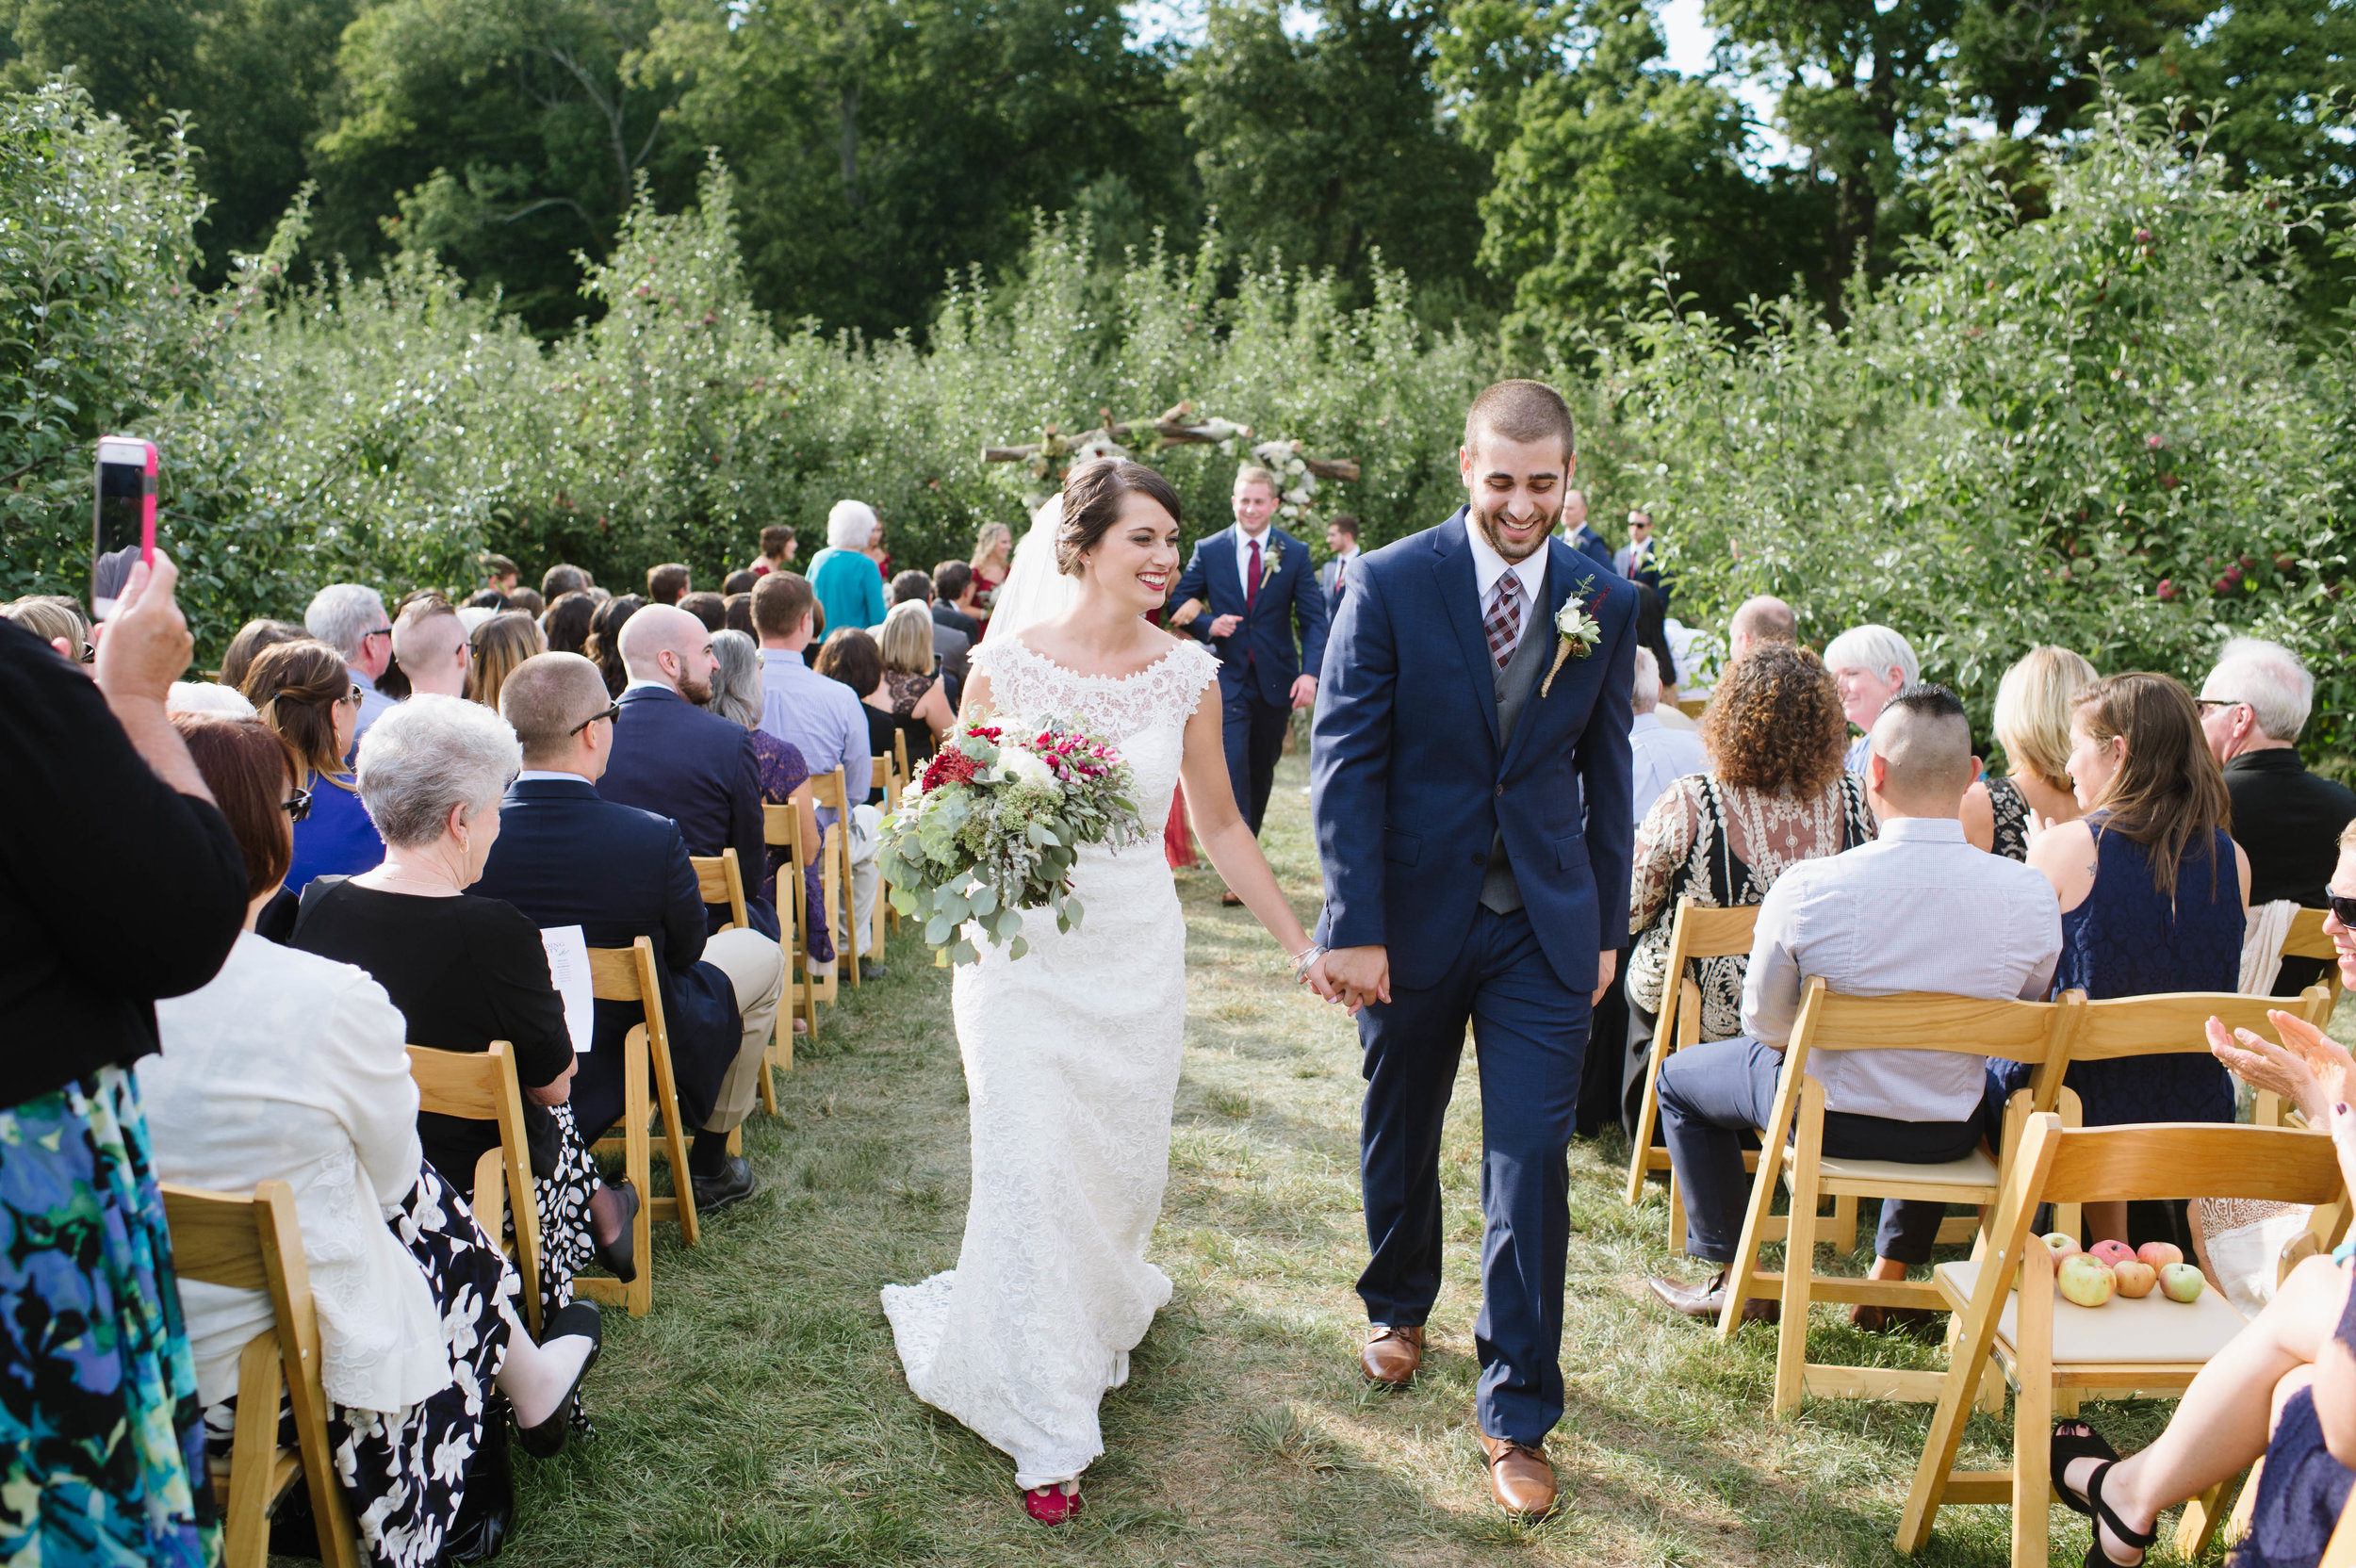 Candid-Wedding-Photography-Boston001.jpg